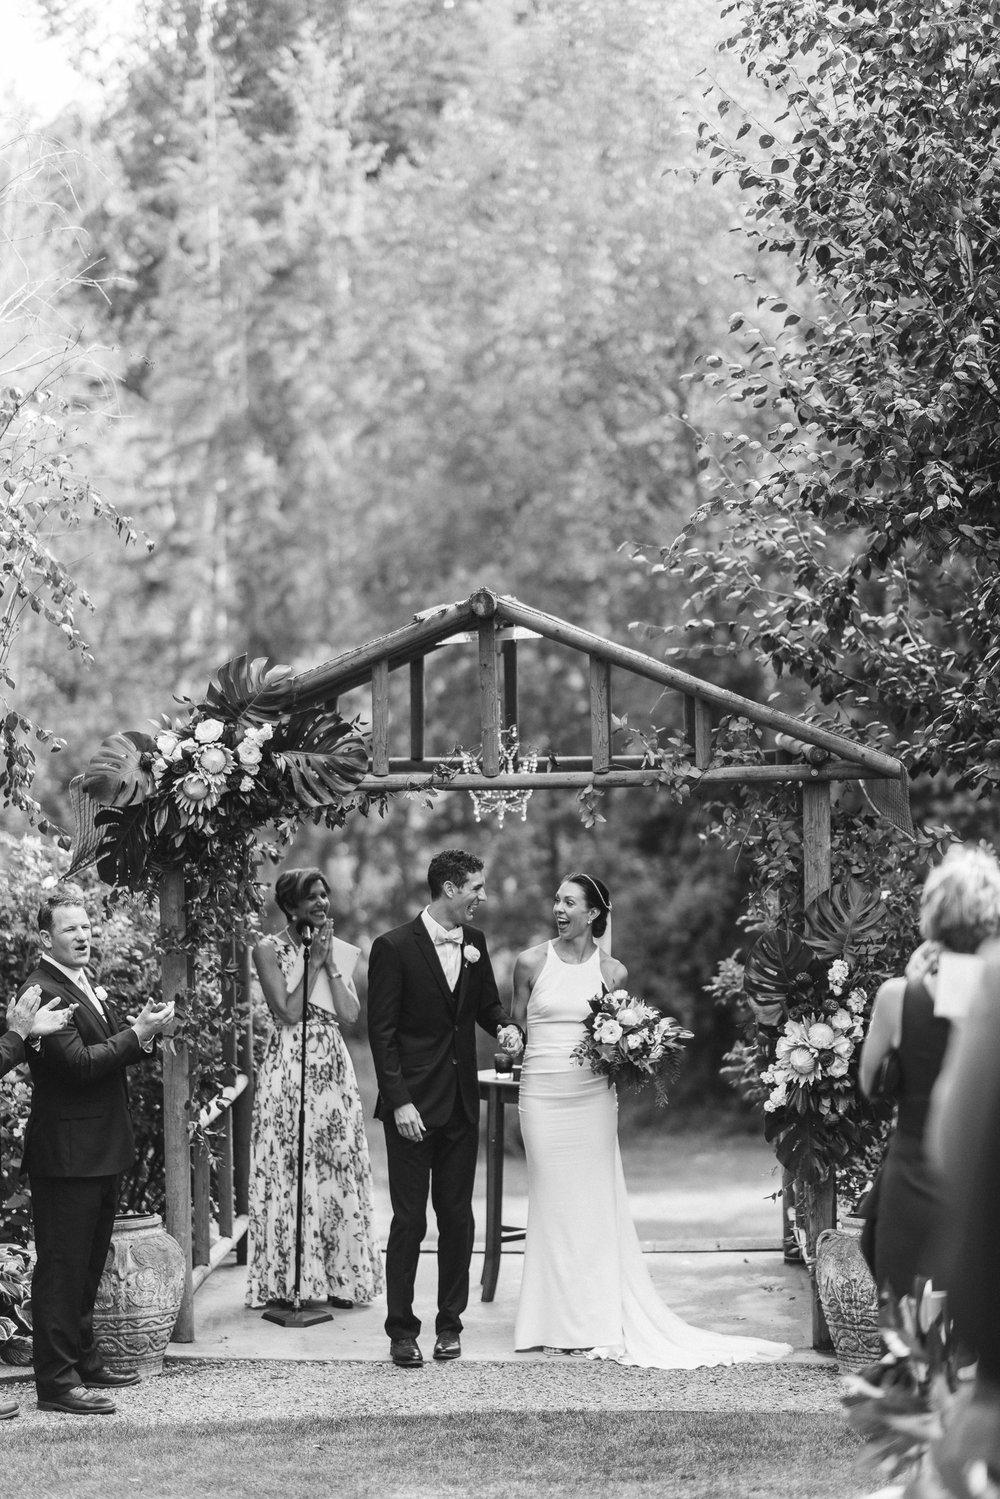 BEST_CHICAG_WEDDING_PHOTOGRAPHER_ZOE_RAIN_-64.jpg